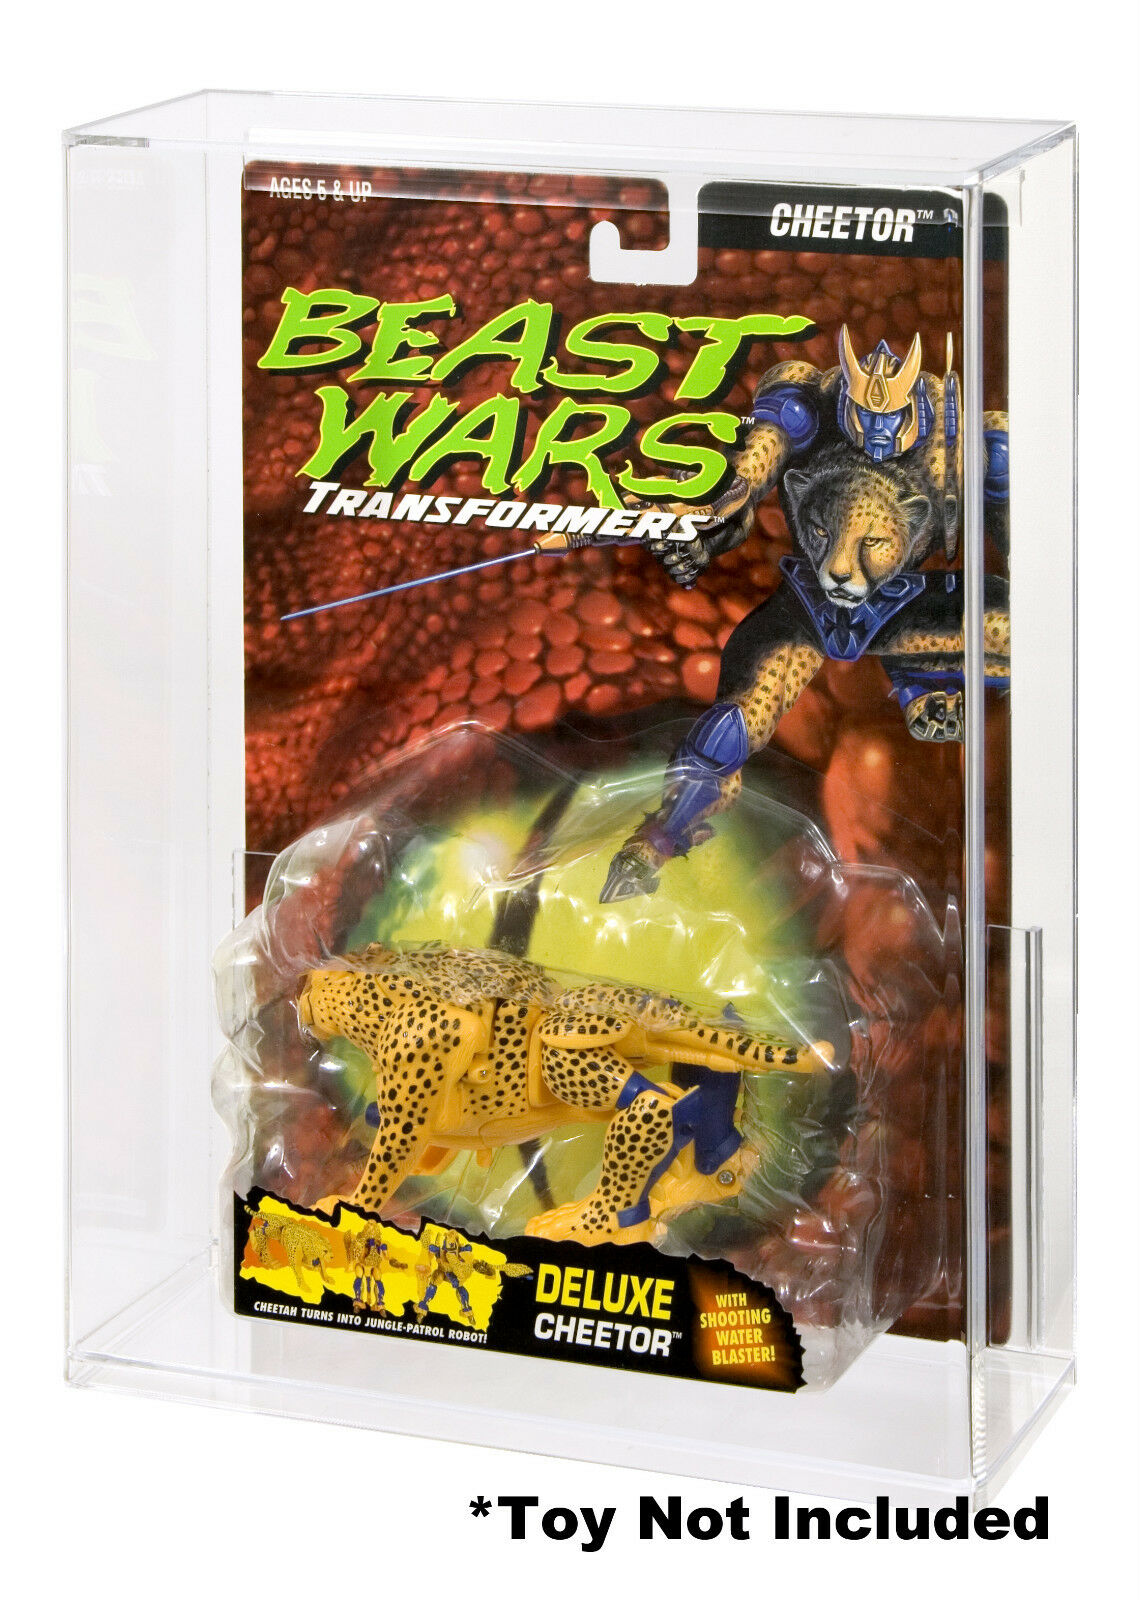 Transformers Beast Wars Deluxe Acrylic Display Case